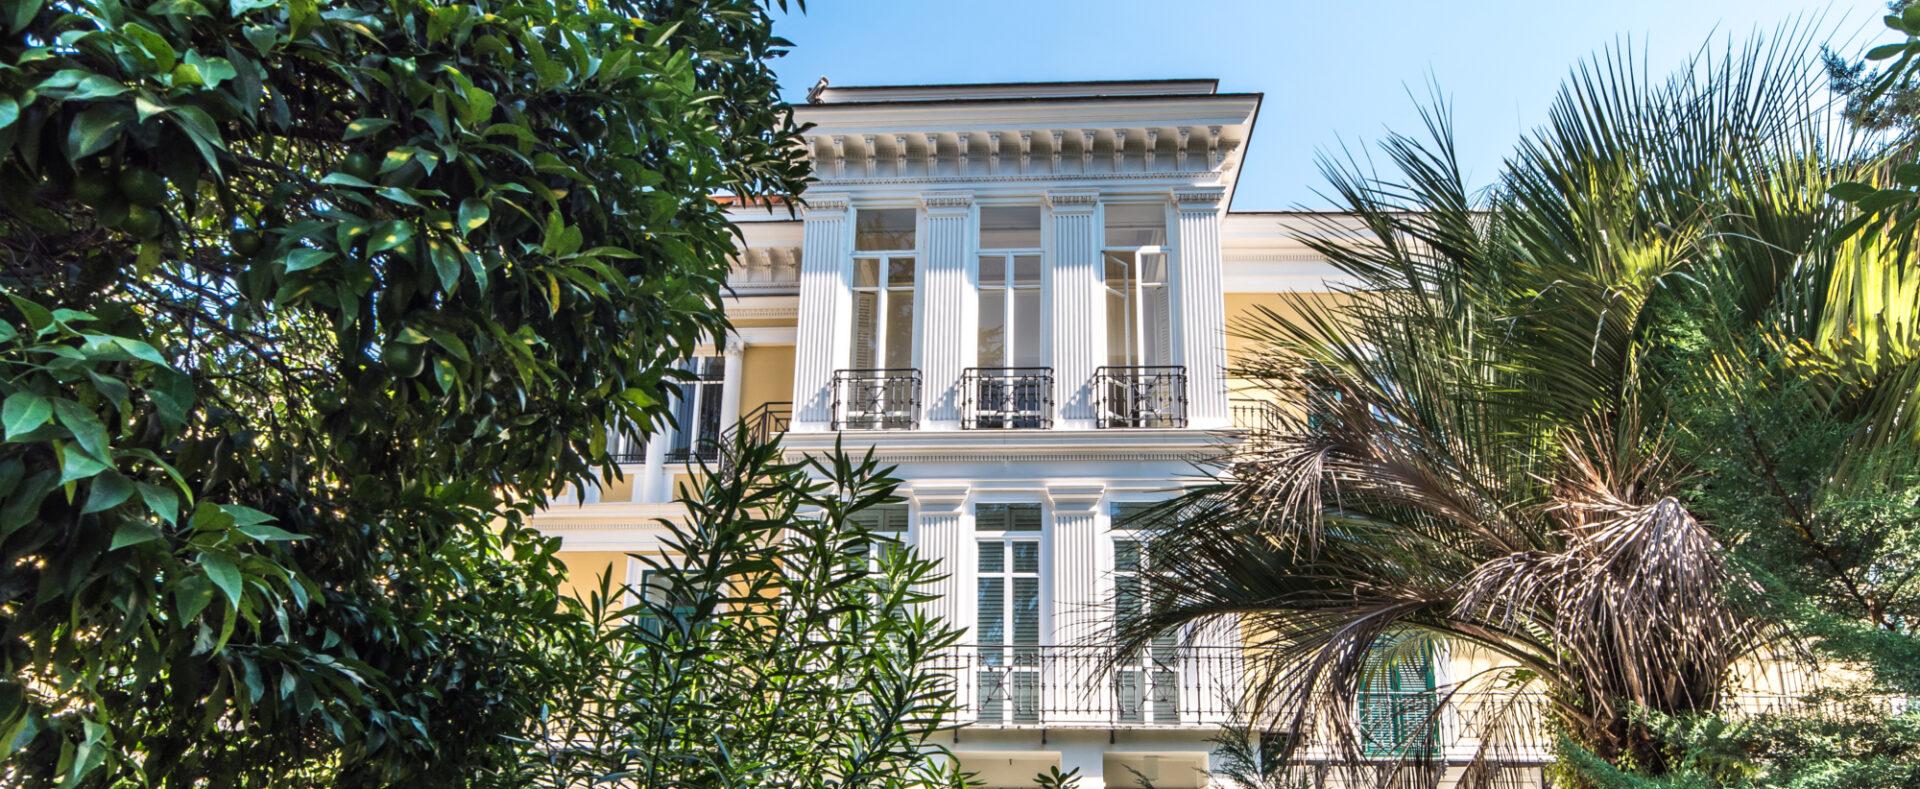 Pontano 44 Napoli - Immobili Cittamoderna